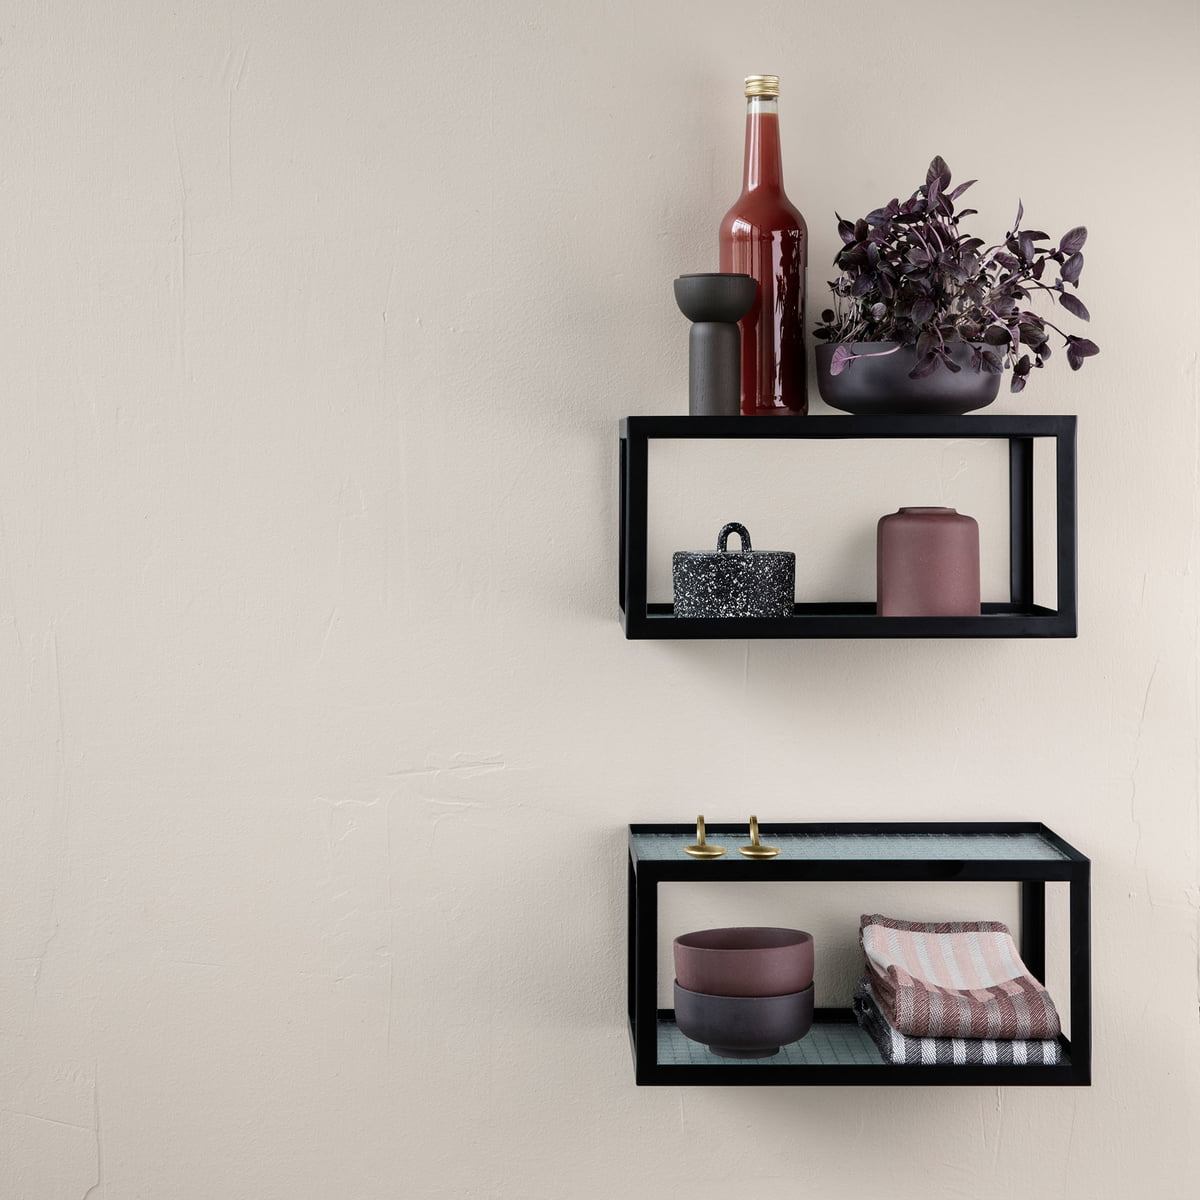 haze wandregal von ferm living connox. Black Bedroom Furniture Sets. Home Design Ideas